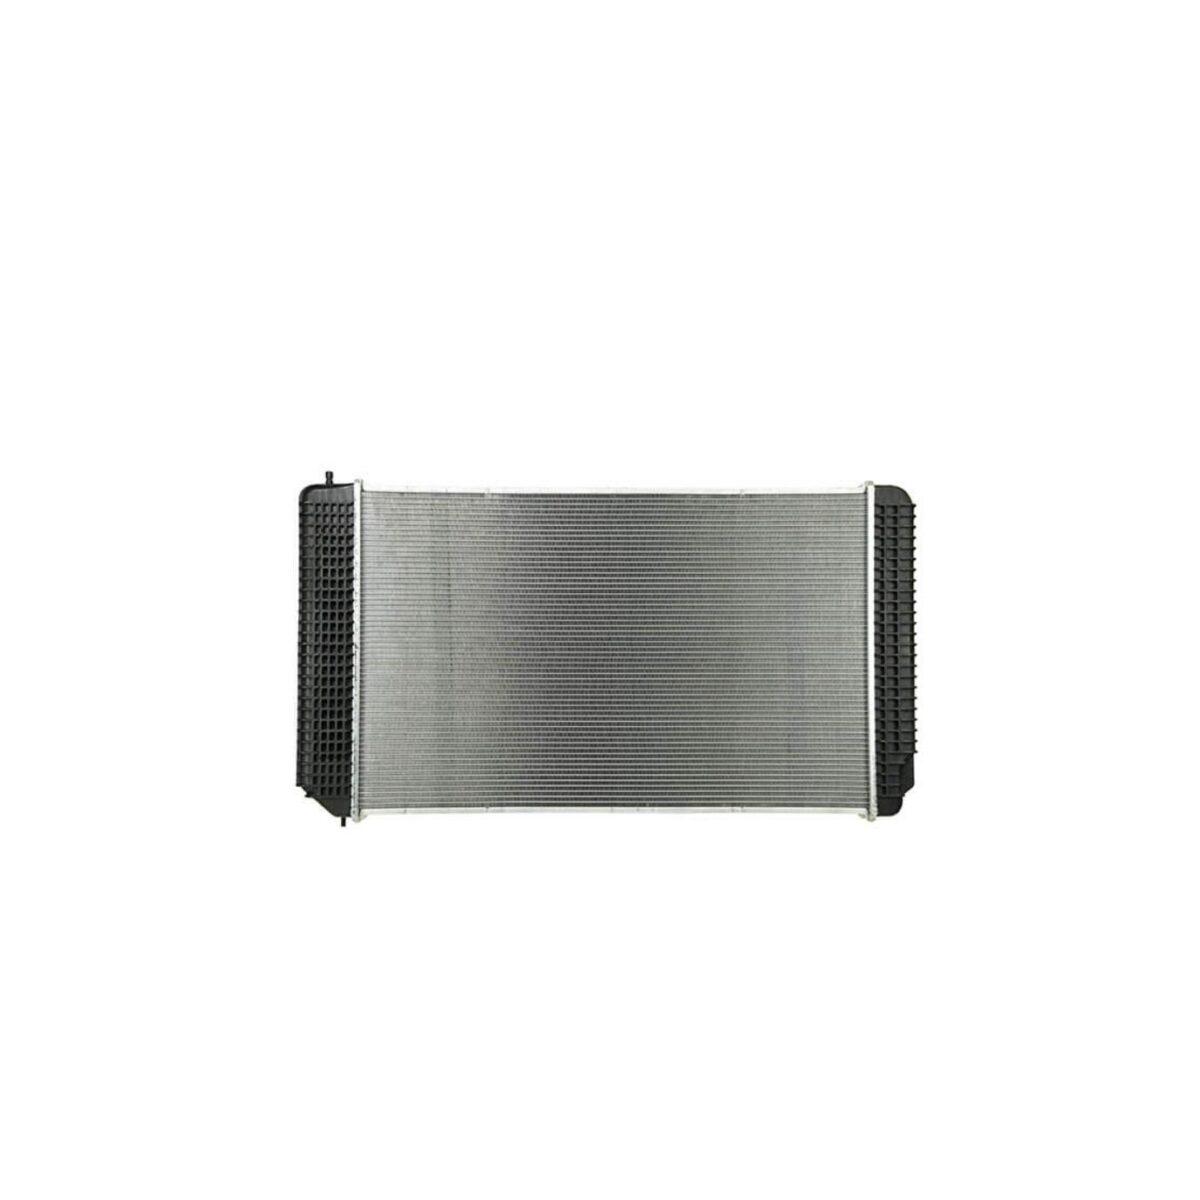 gmc c6500c7500c8500kodiaktopkick 2004 2007 radiator oem 1003643ar 2